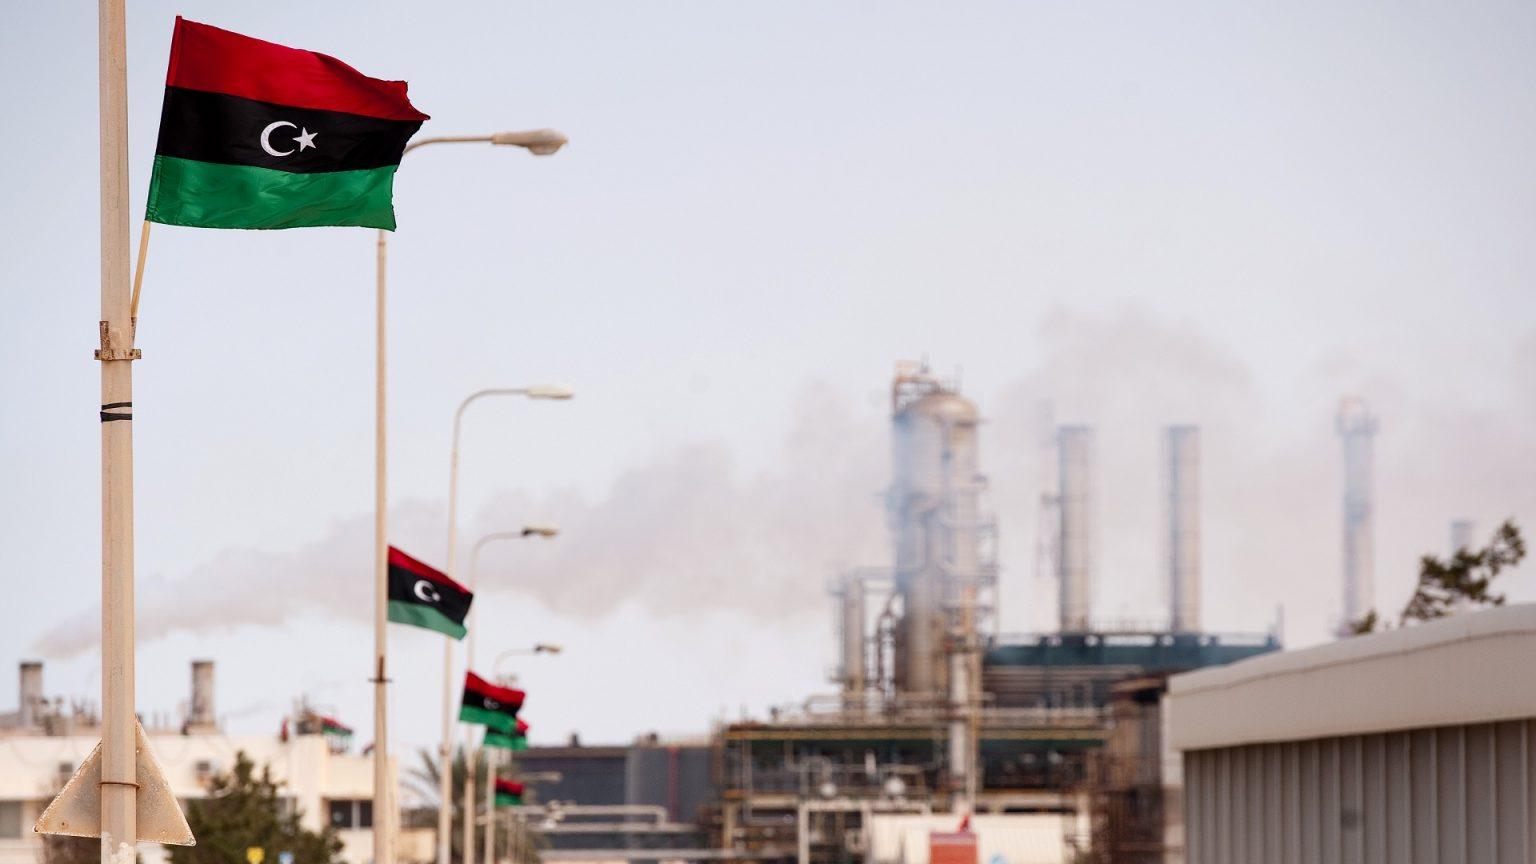 Libya's oil revenues